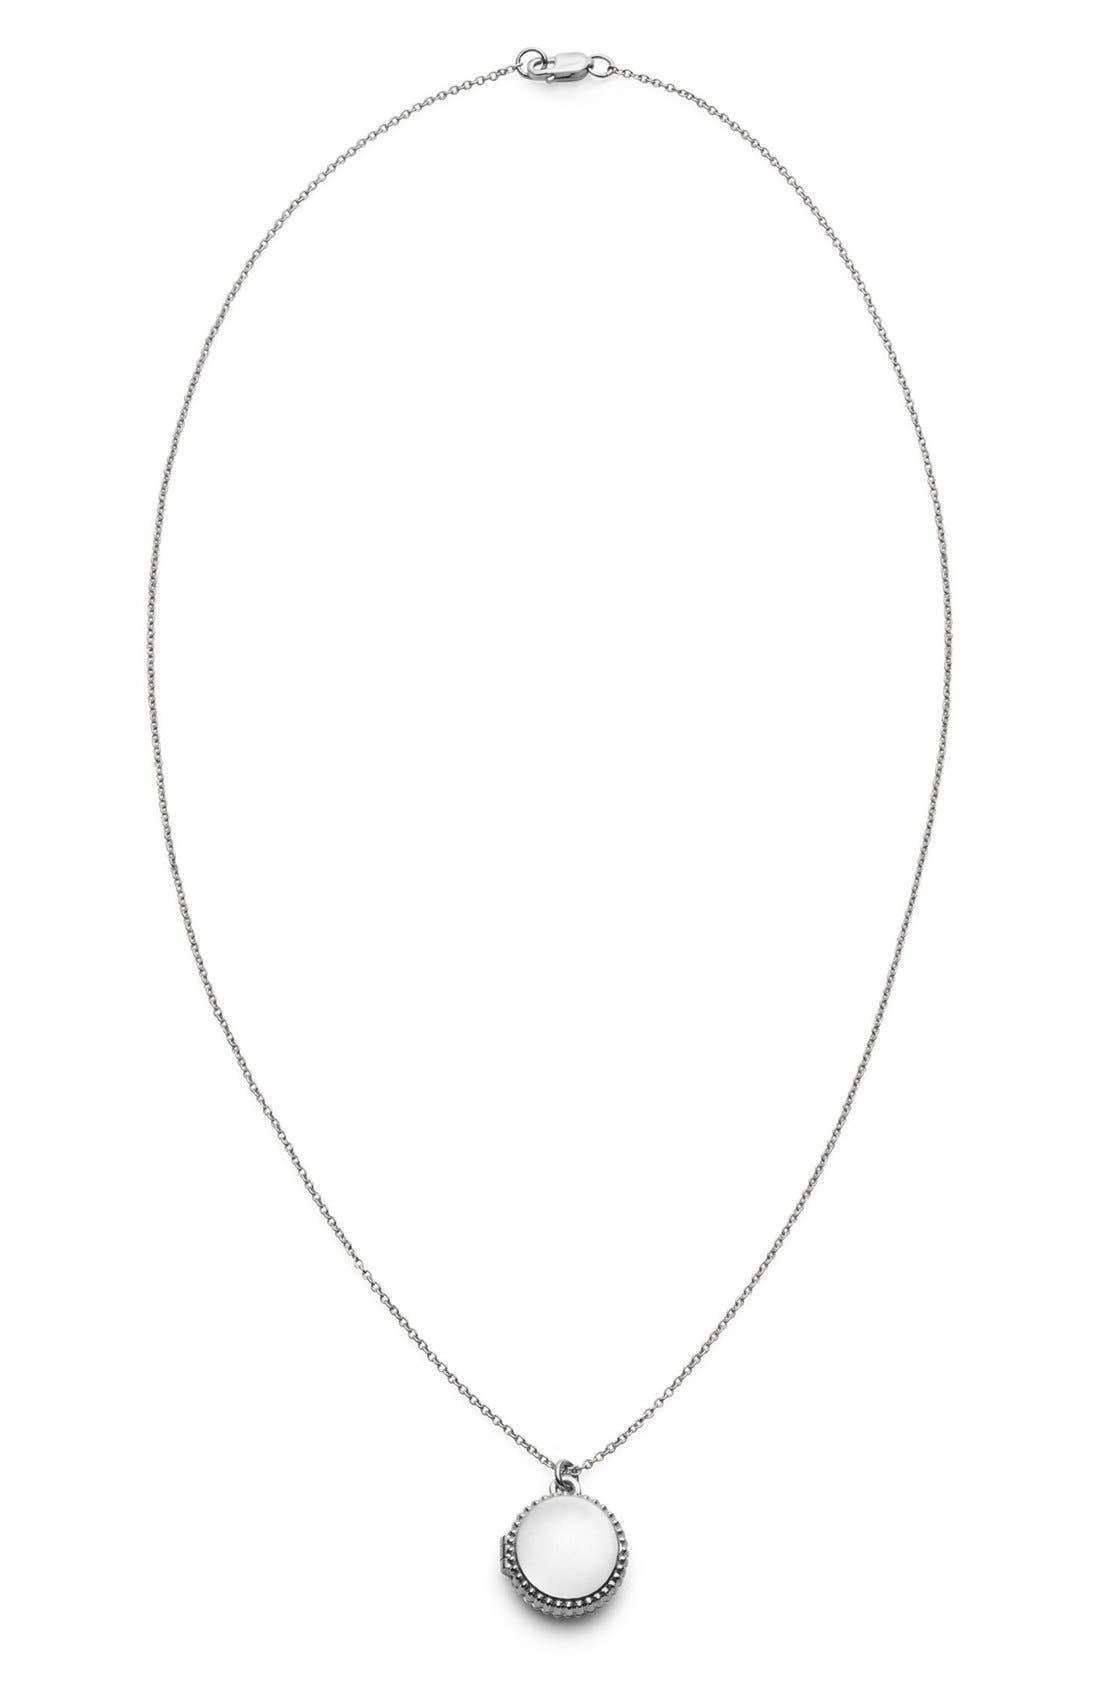 Coin Edge Locket Necklace,                             Main thumbnail 1, color,                             Silver